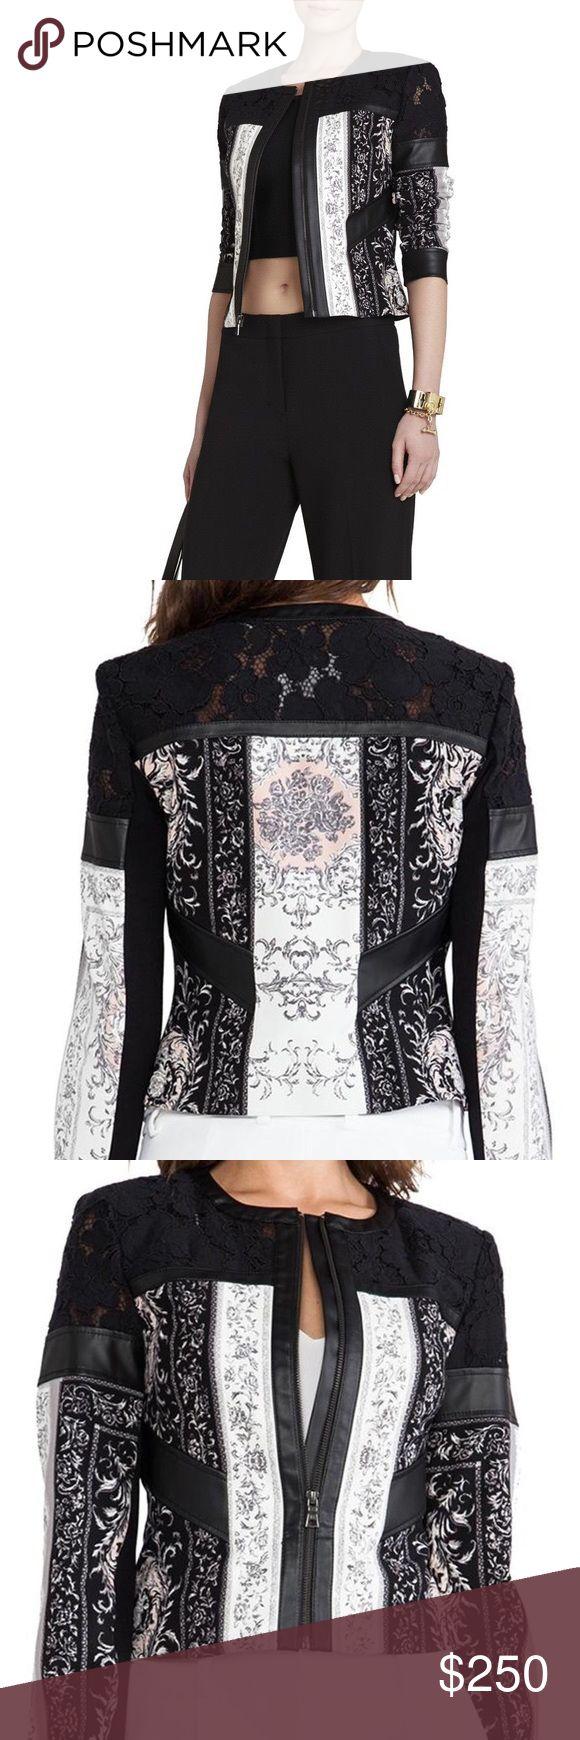 bcbg maxazria lace leather moto jacket worn once excellant condition bcbg jacket BCBGMaxAzria Jackets & Coats Blazers